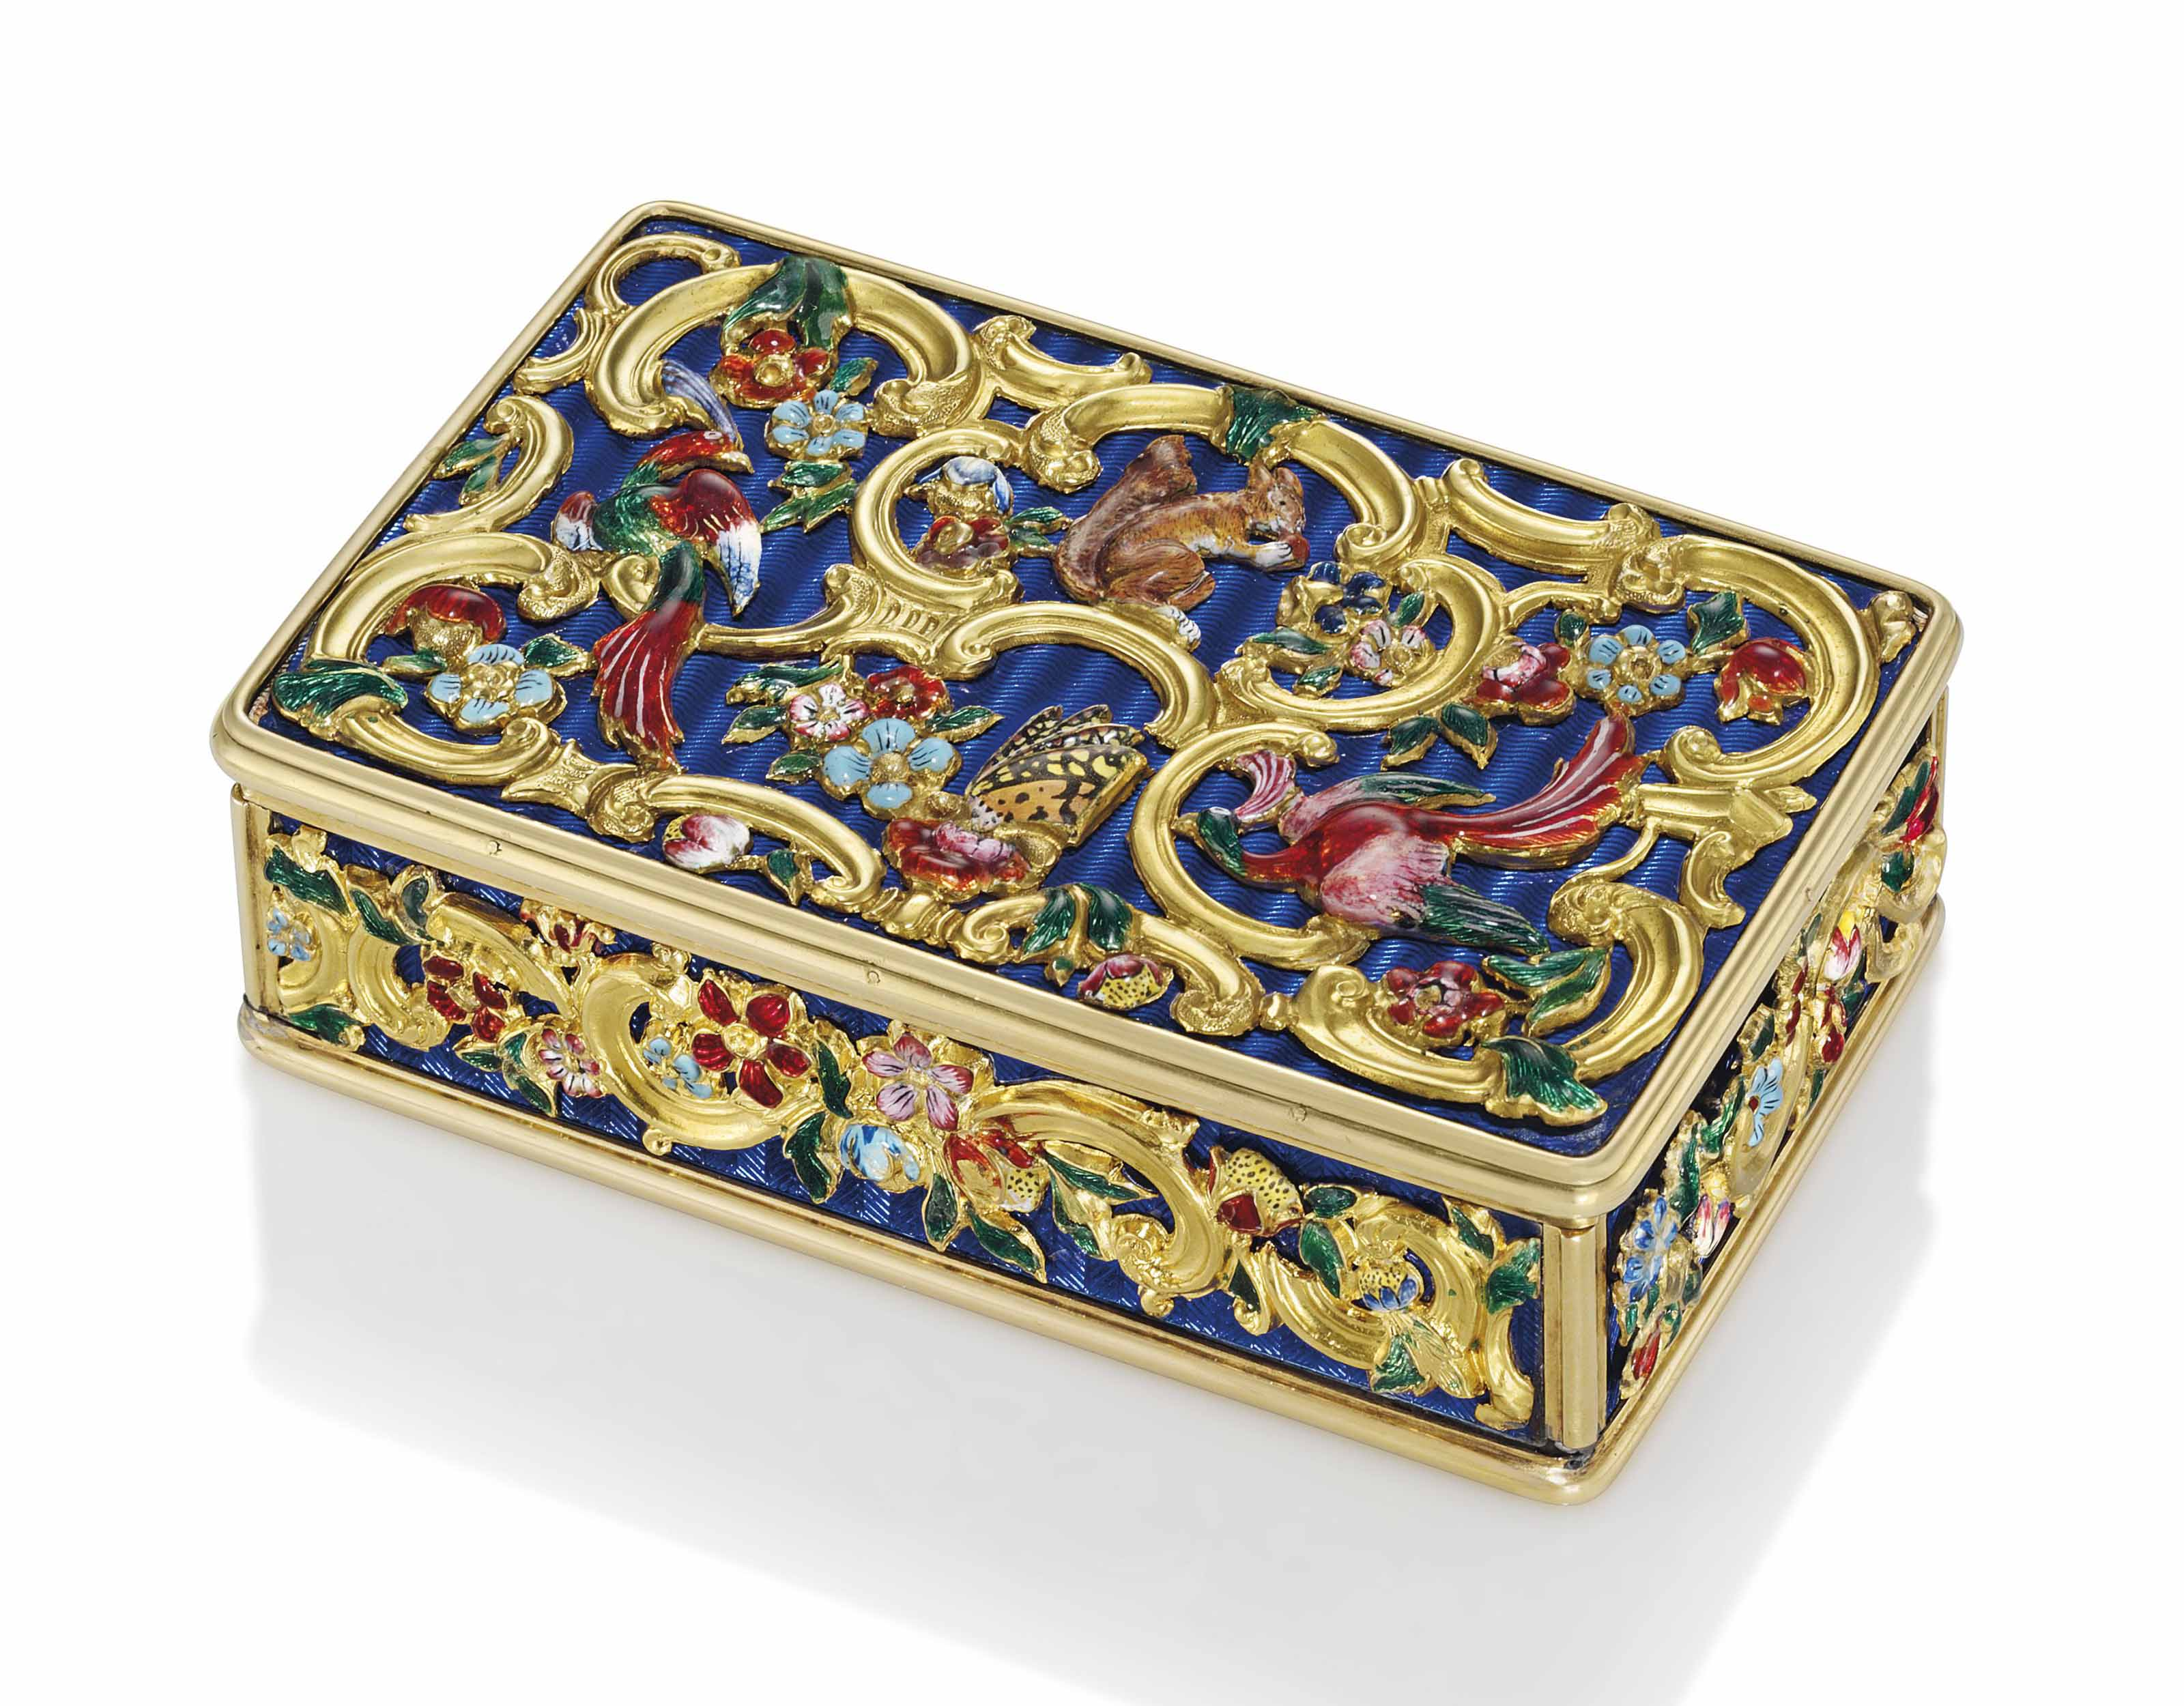 A REGENCY ENAMELLED GOLD SNUFF-BOX